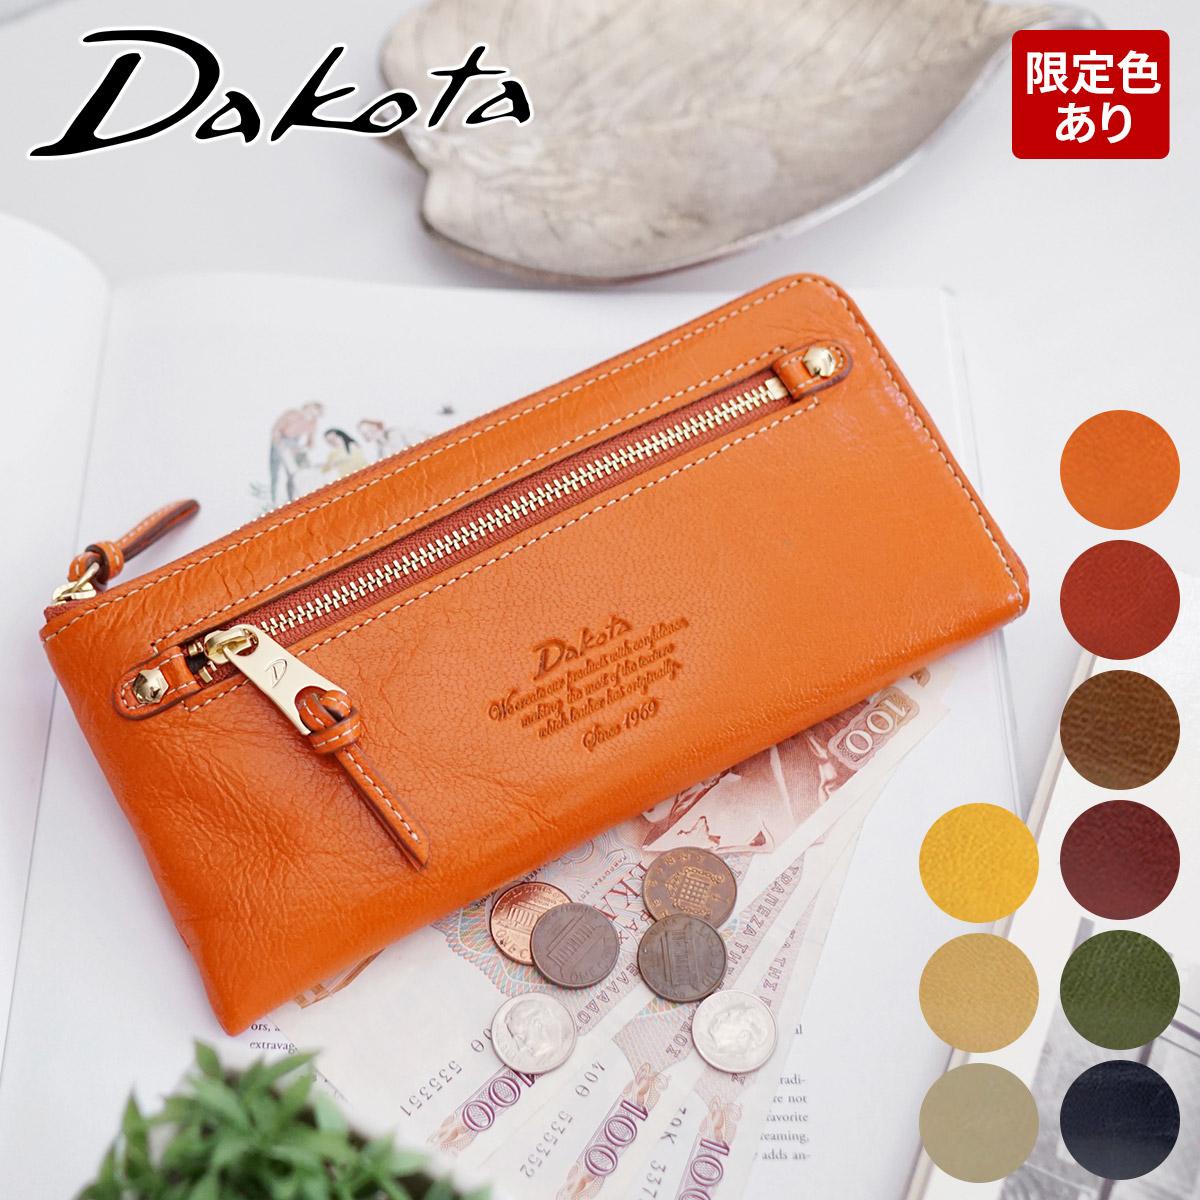 a4e510afae71 プレゼントに!20代女子が喜ぶブランドのお財布ランキング【1ページ】|Gランキング